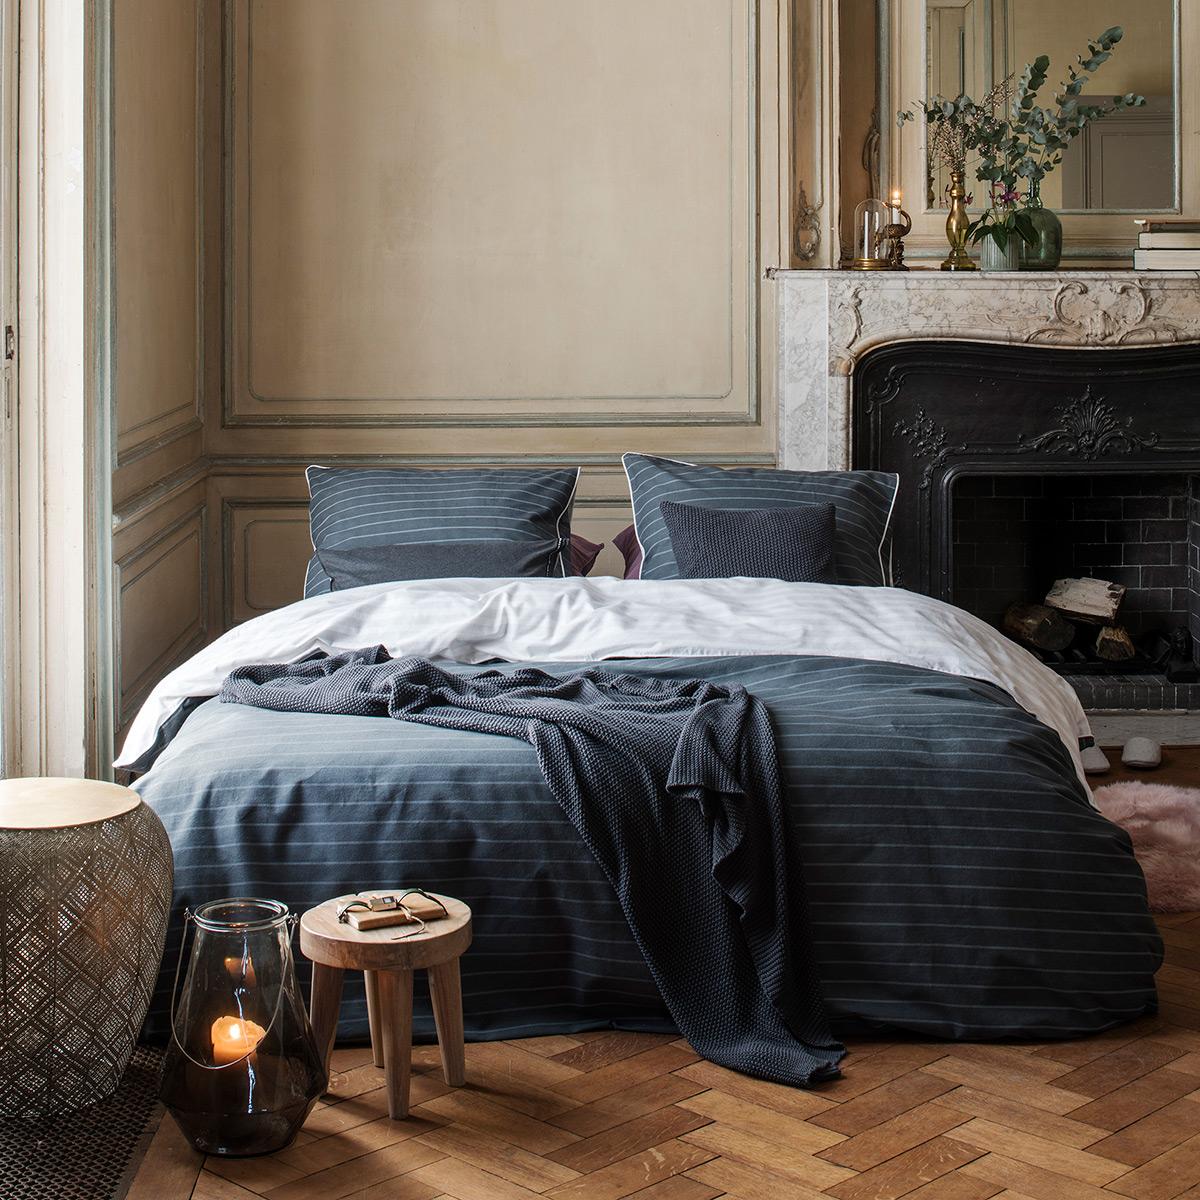 Walra rustgevende slaapkamer